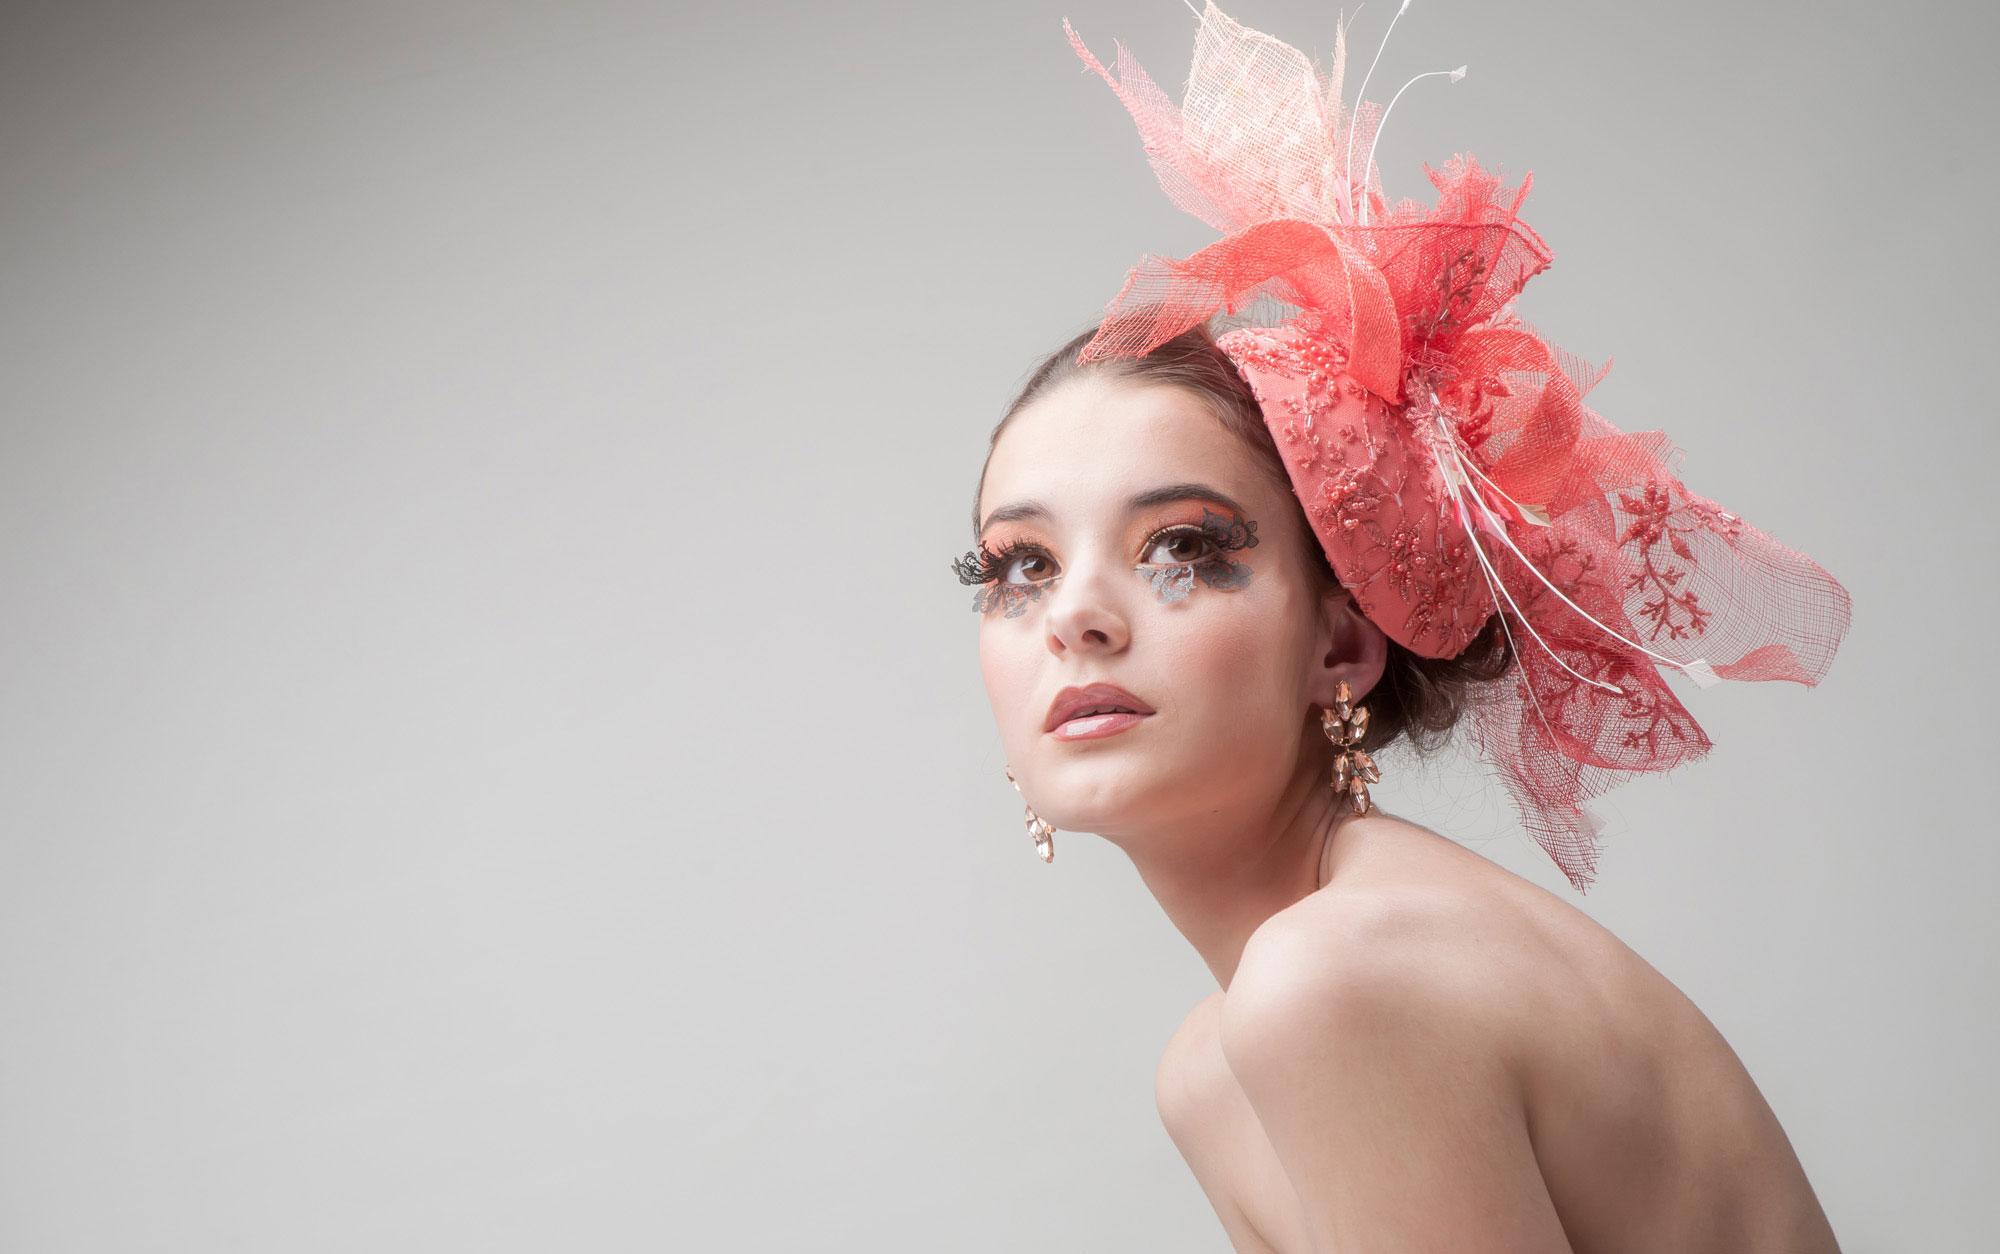 Make Up & Hat Alejandro Arias Bazan